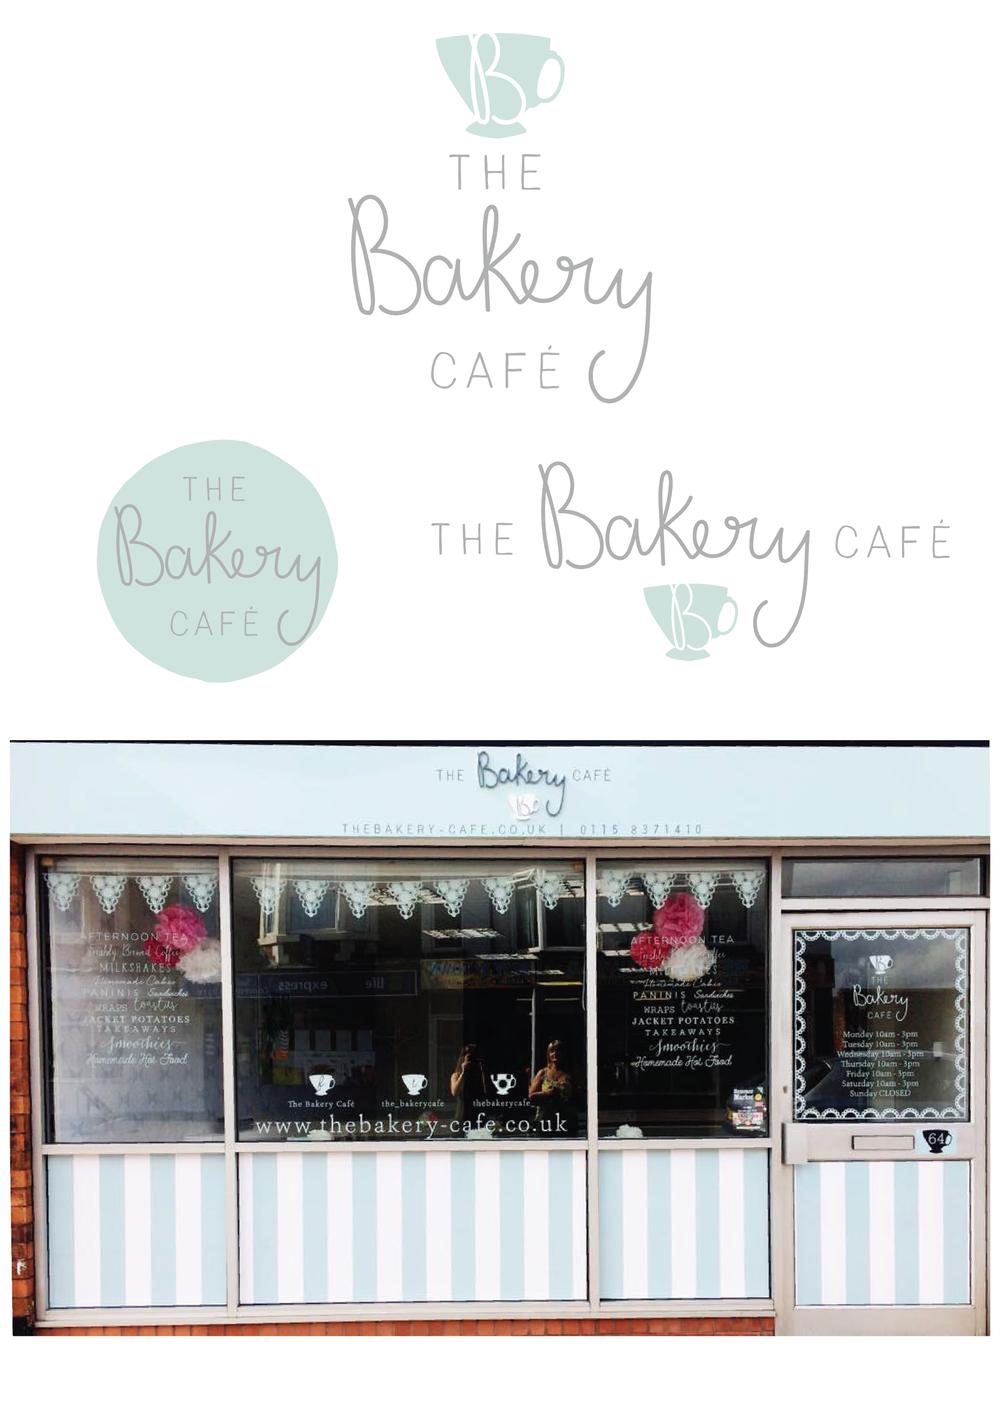 The Bakery Cafe - Logo Design, Branding and Shop Front Design. Inc. vinyl designs.